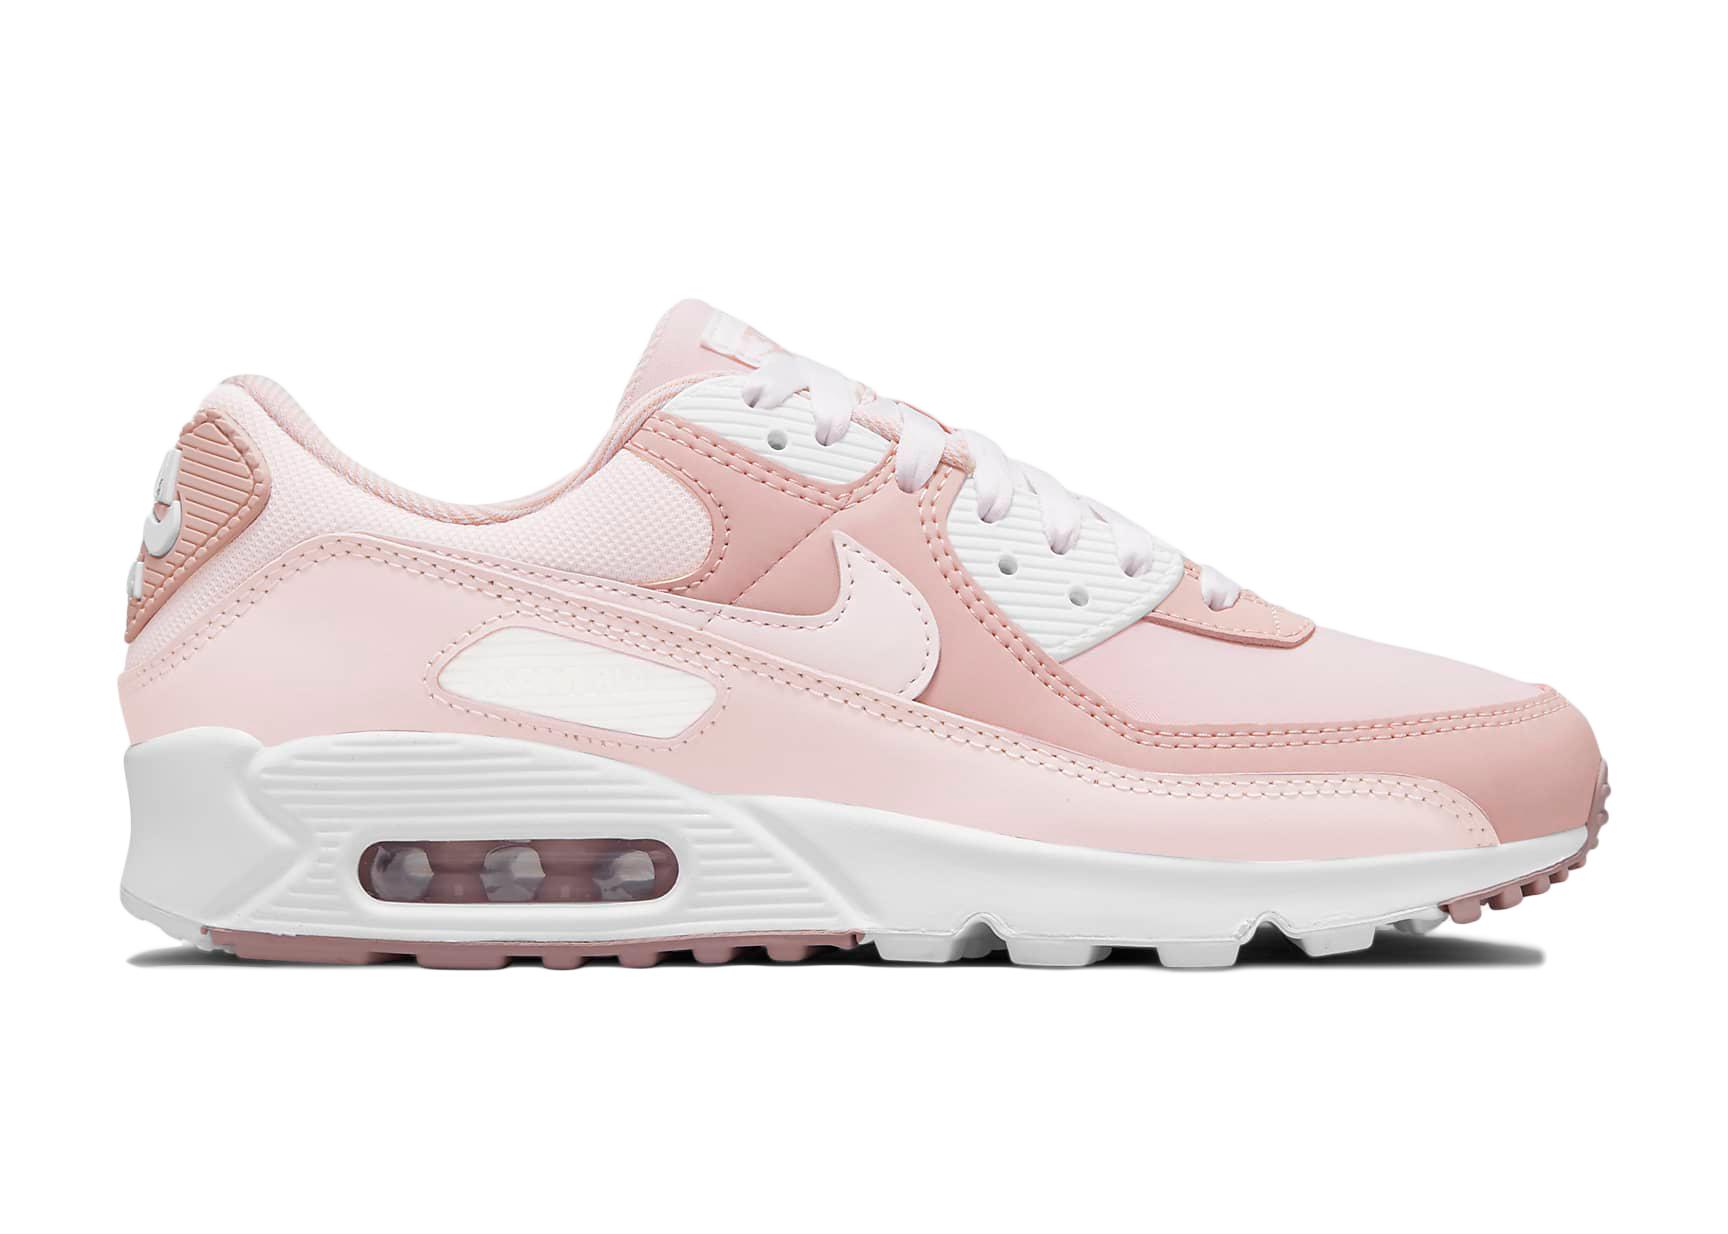 Nike Air Max 90 Pink Oxford (W)